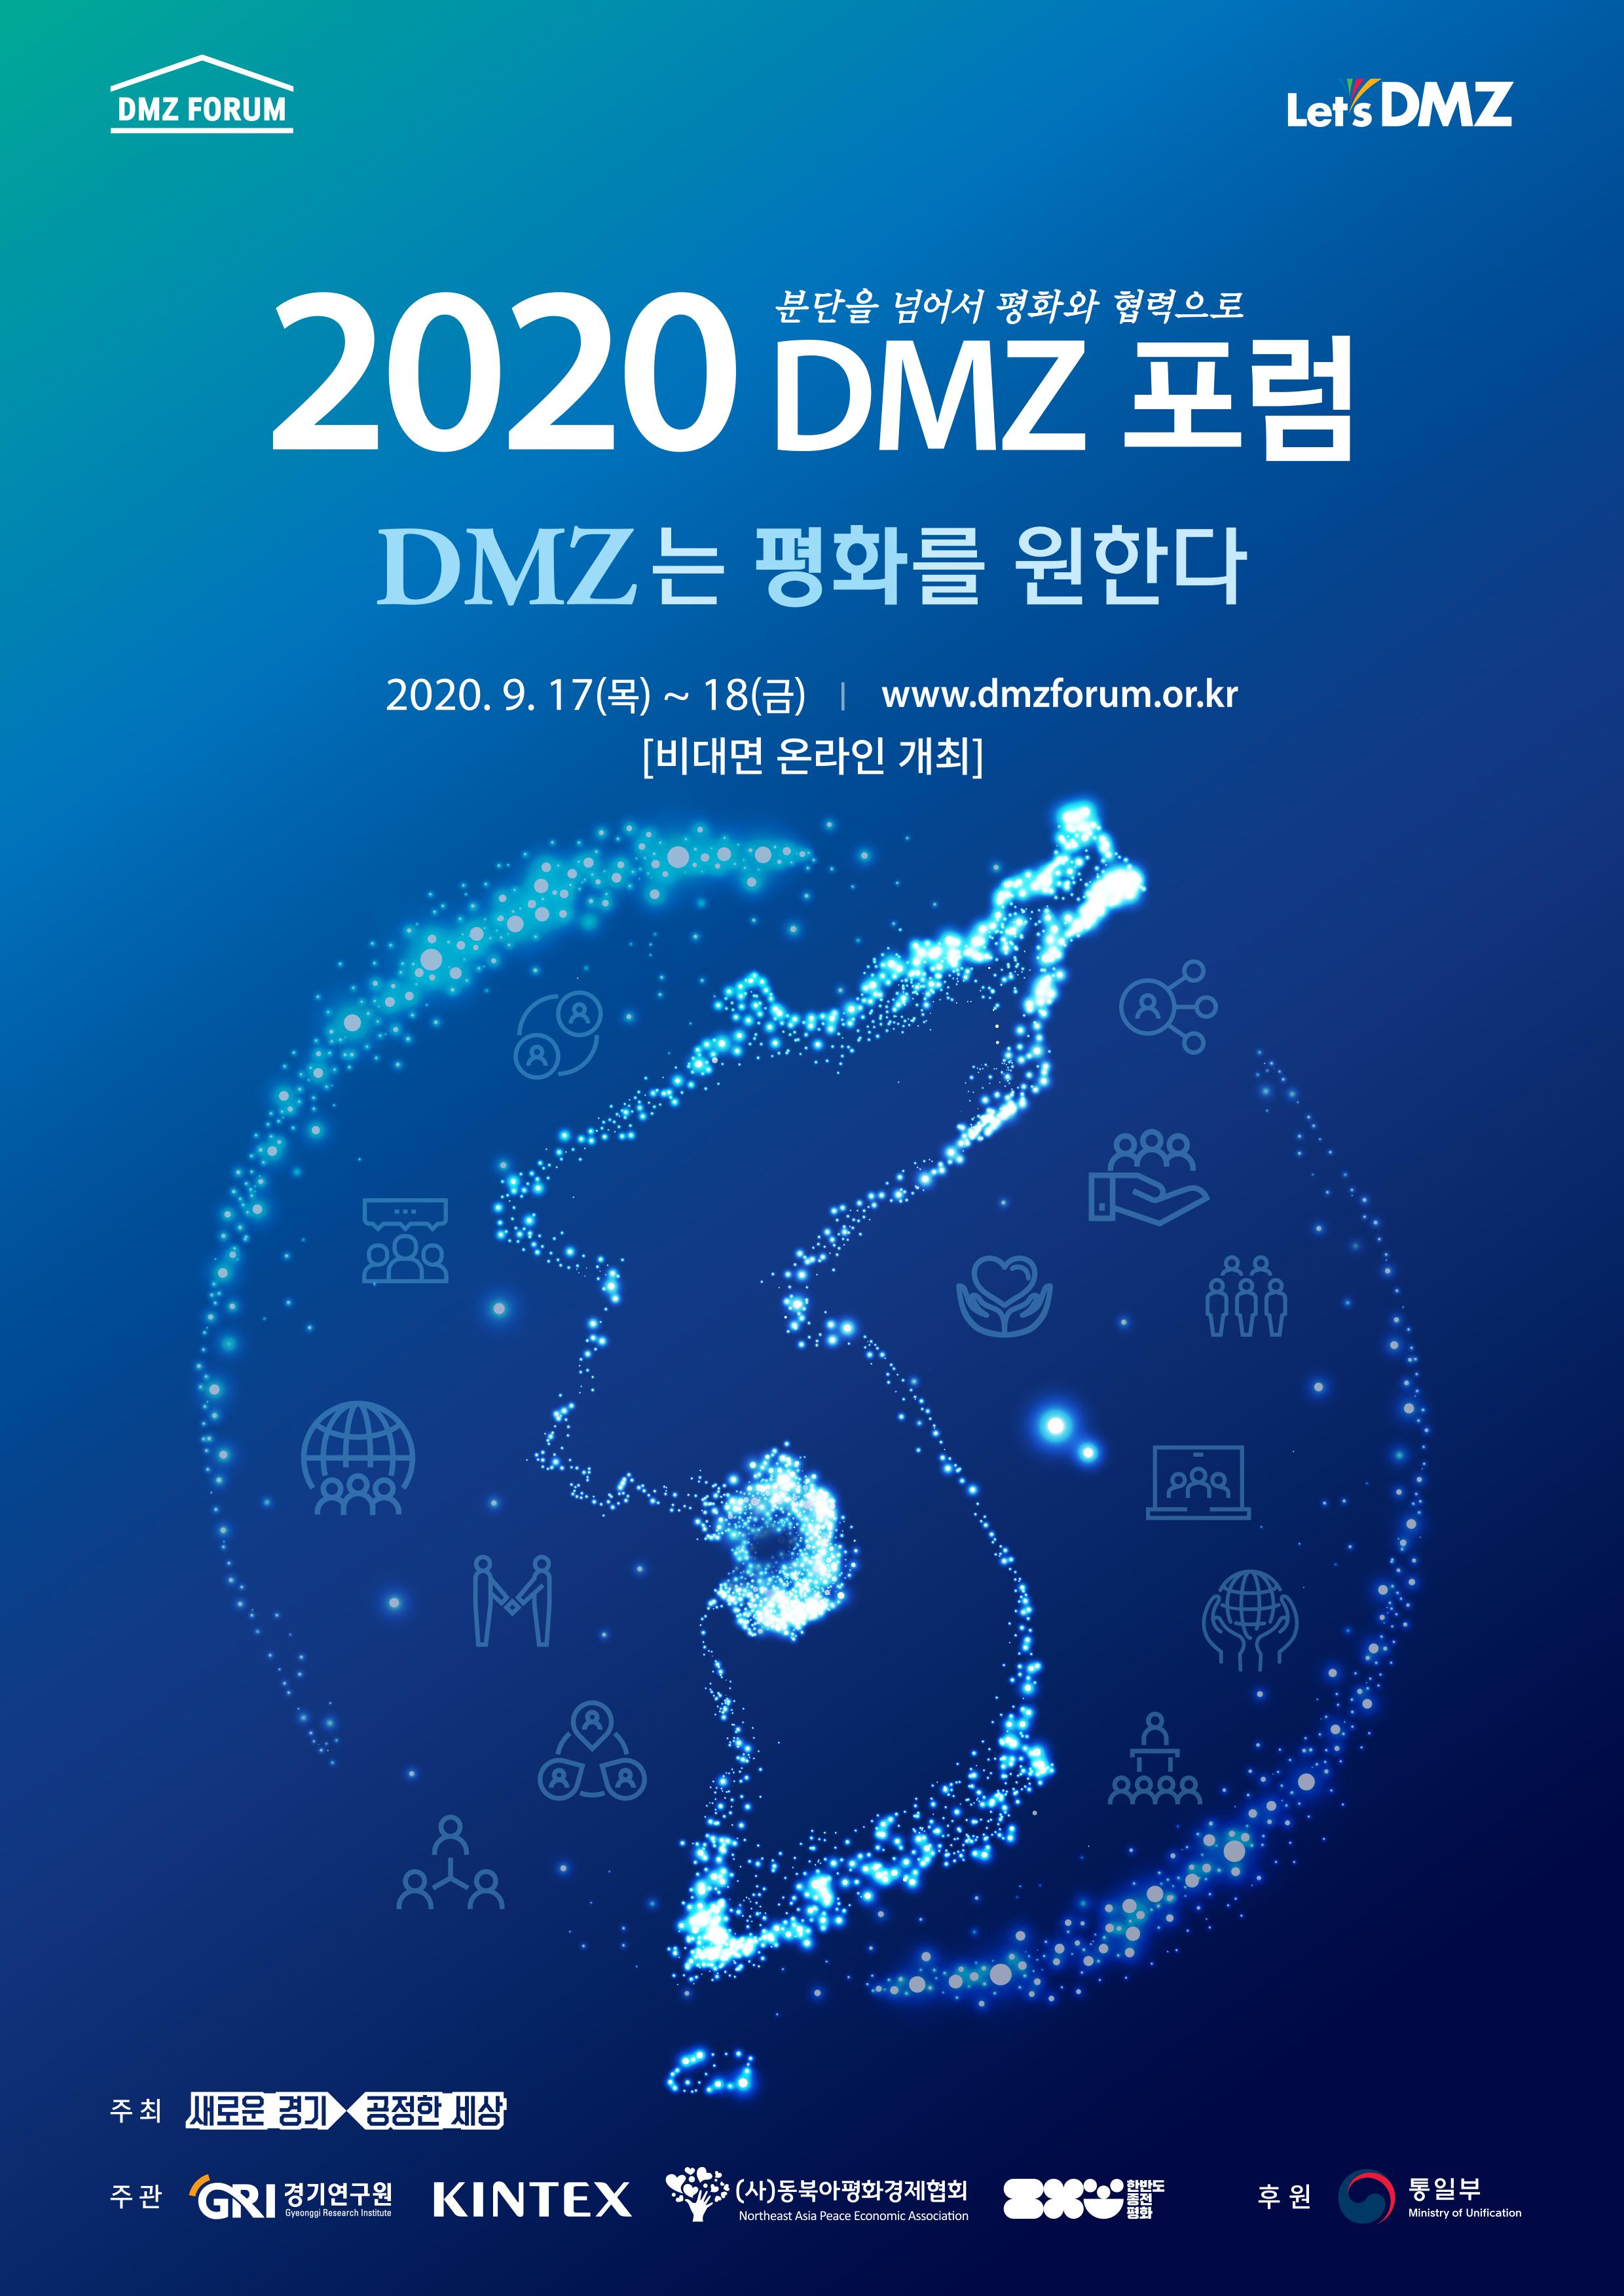 2020 DMZ 포럼